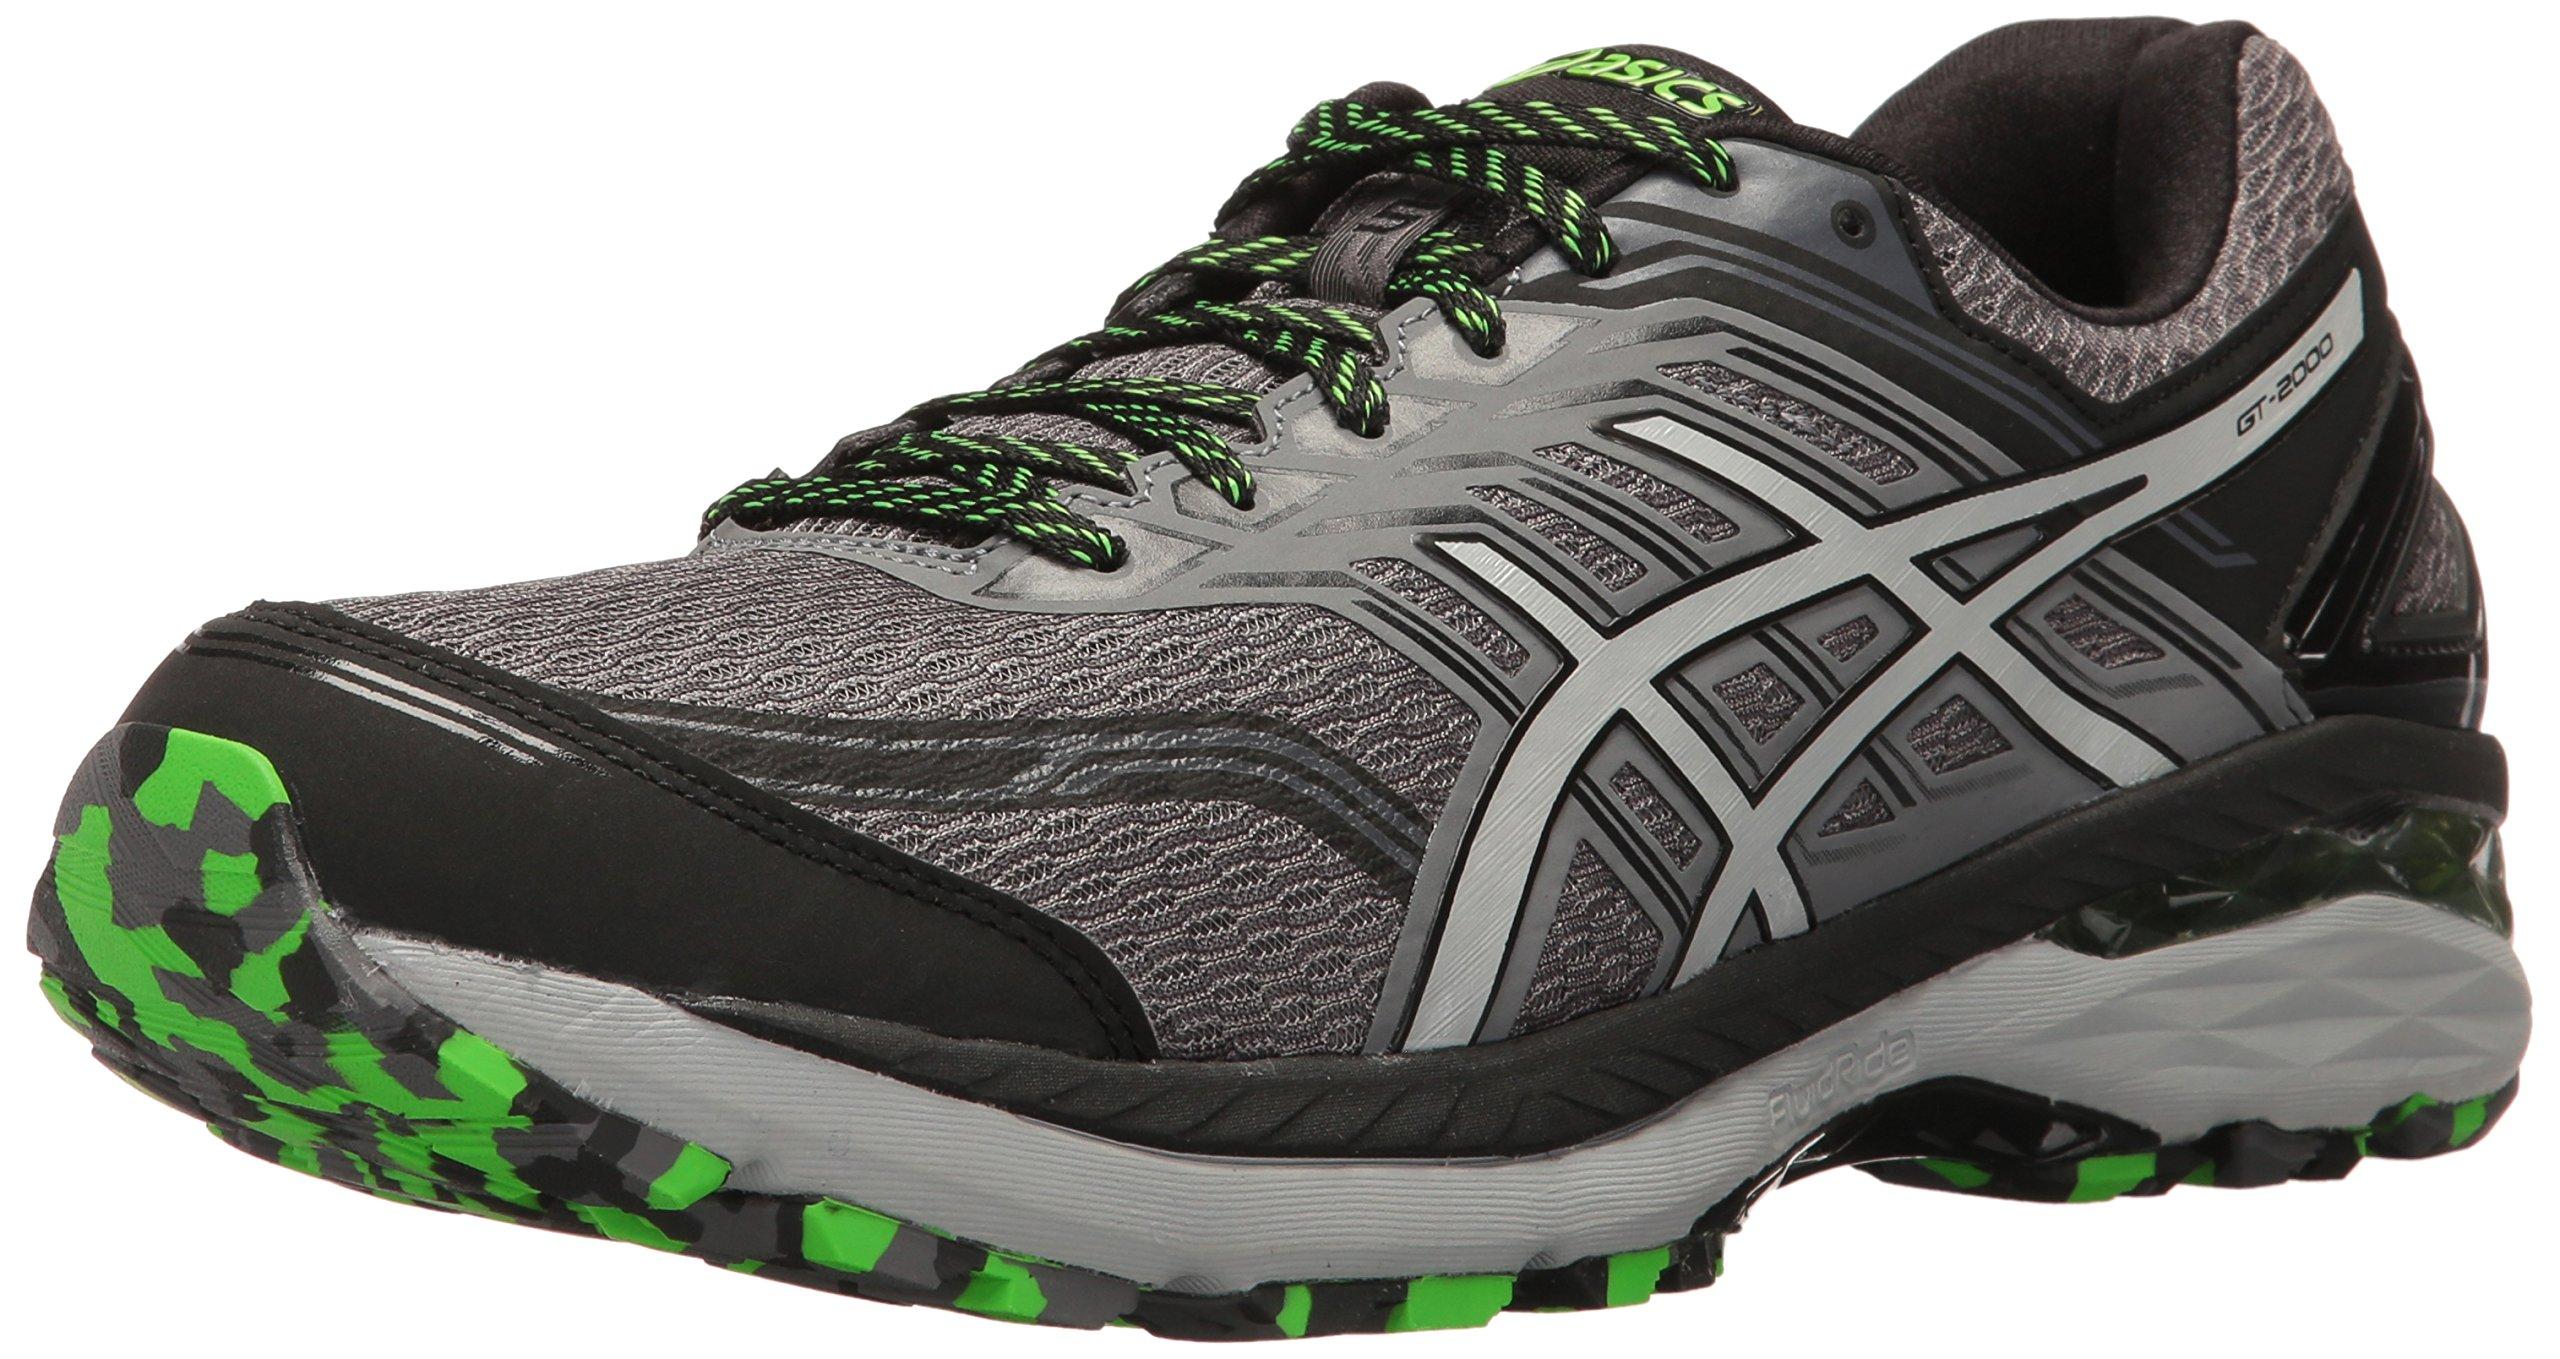 ASICS Men's GT-2000 5 Trail Runner, Carbon/Mid Grey/Green Gecko, 11 M US